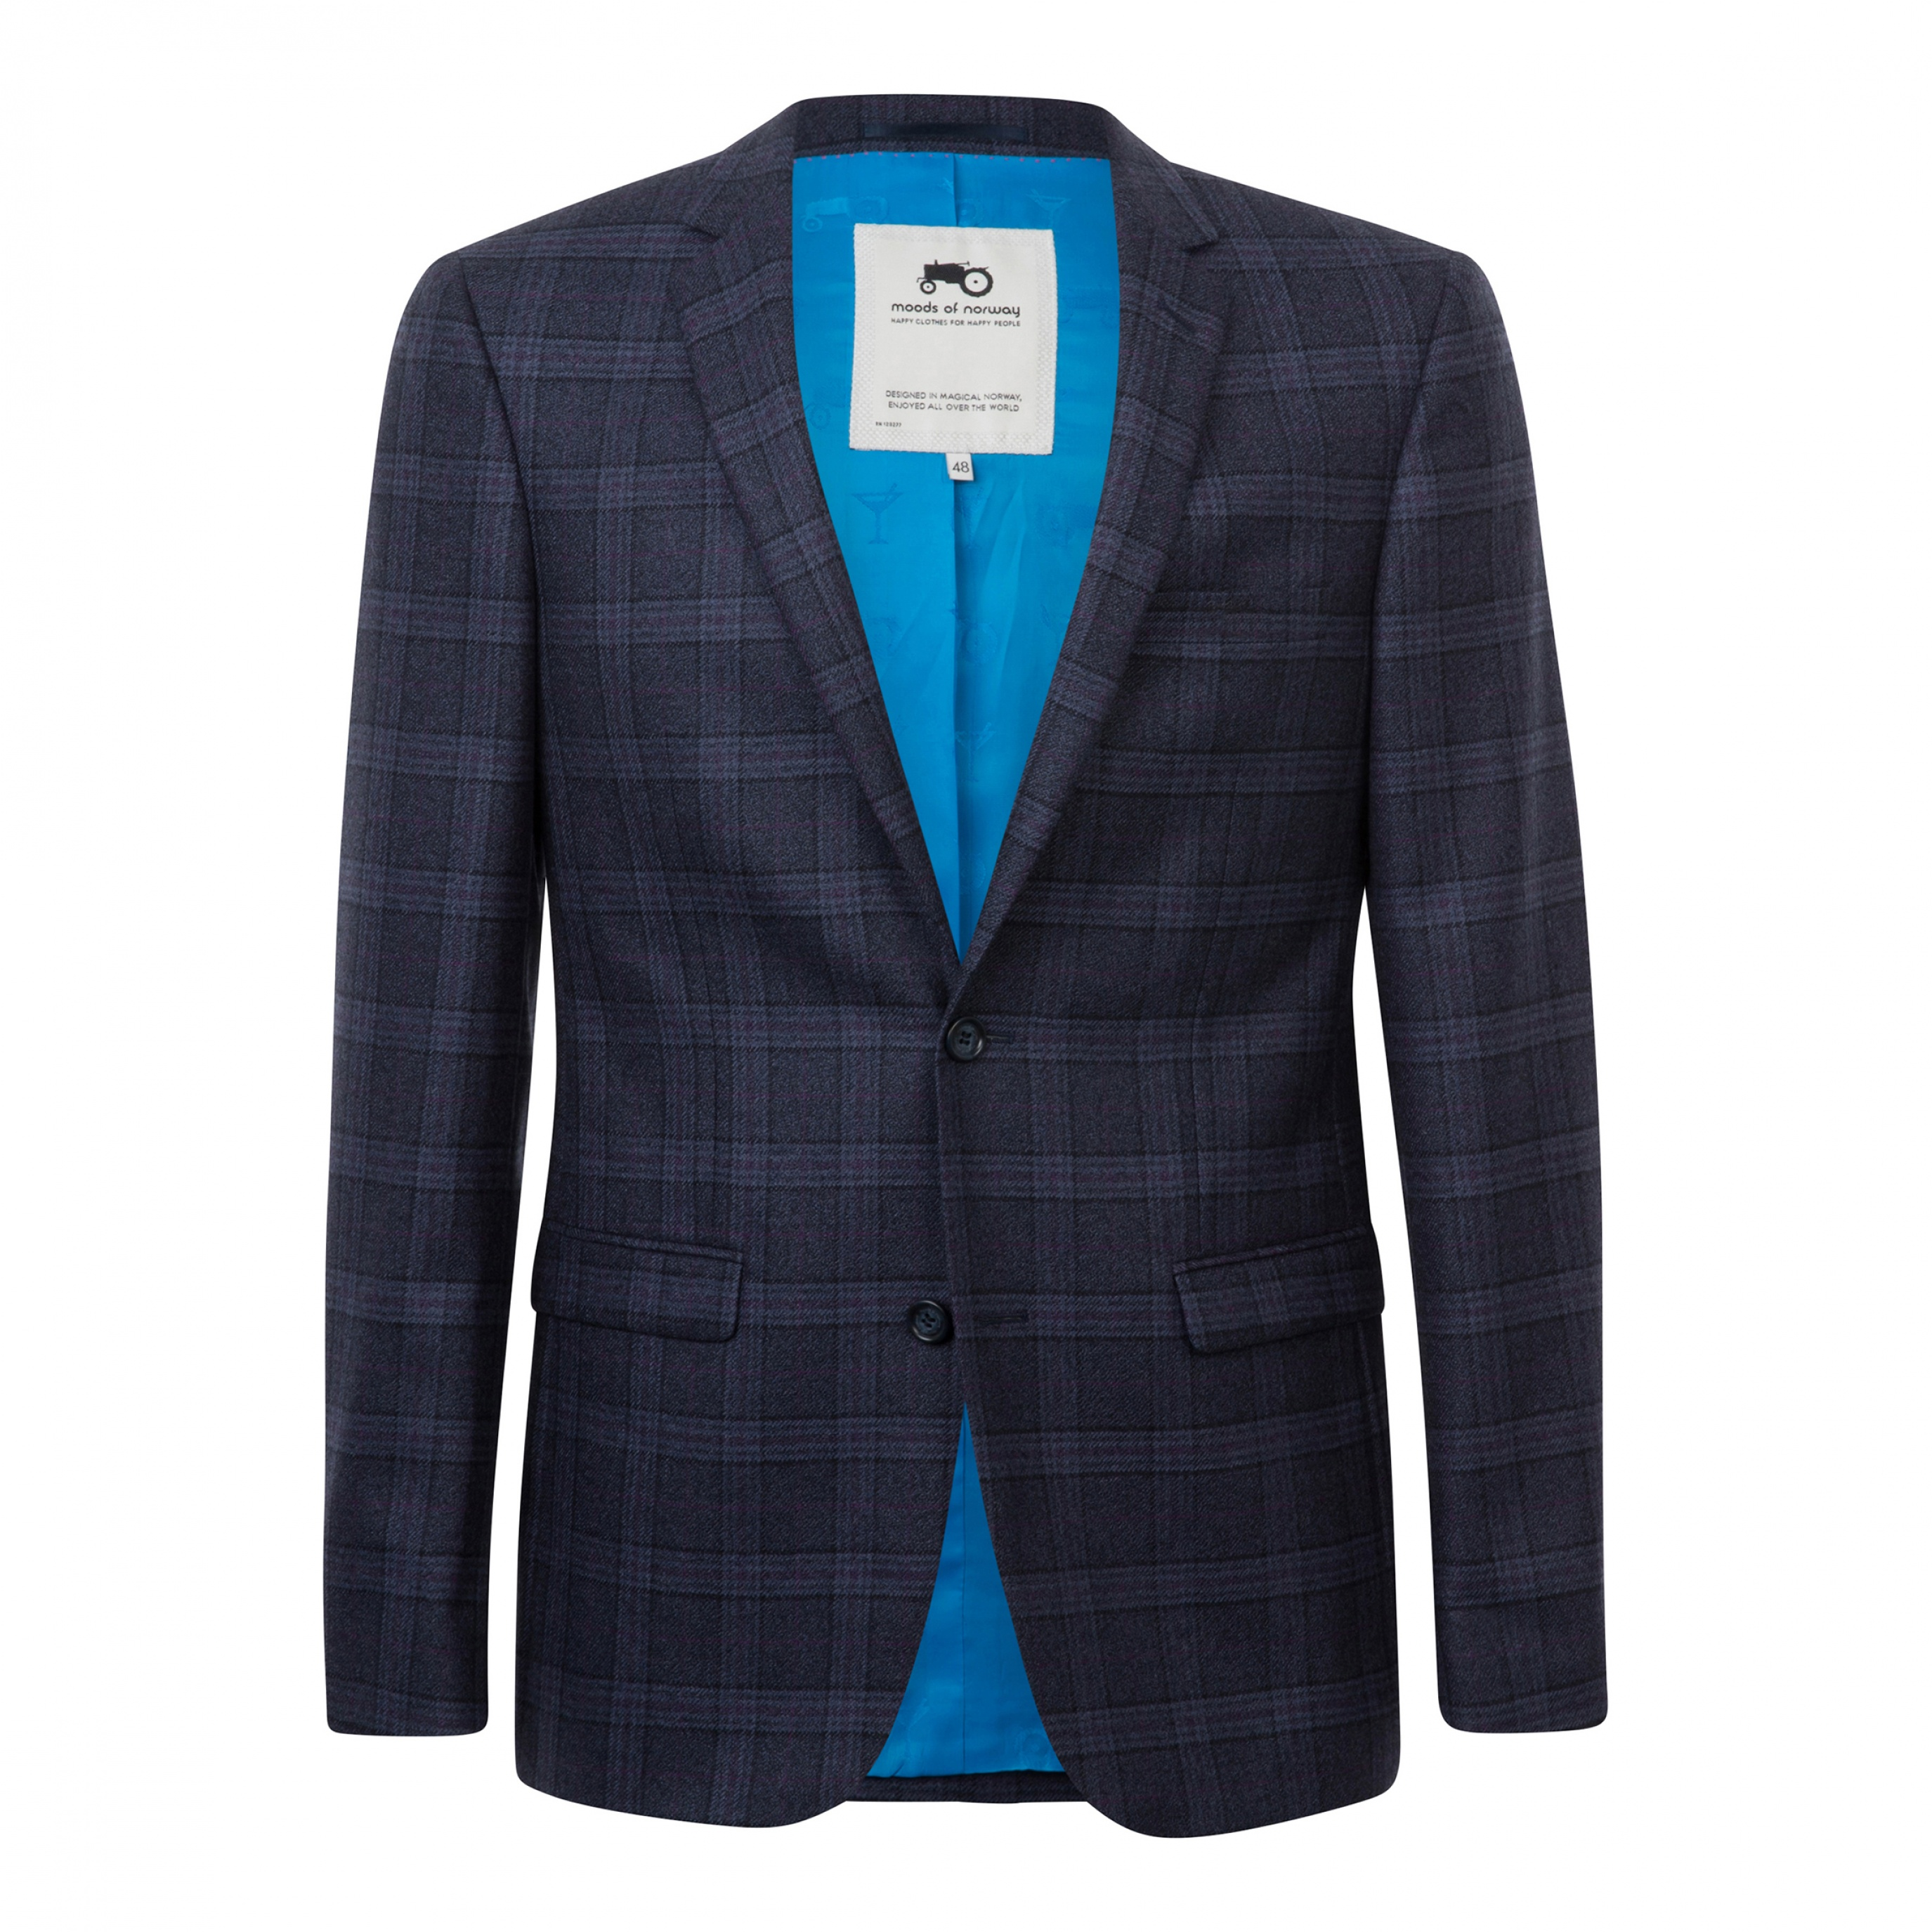 Rolf tonning plaid suit jacket